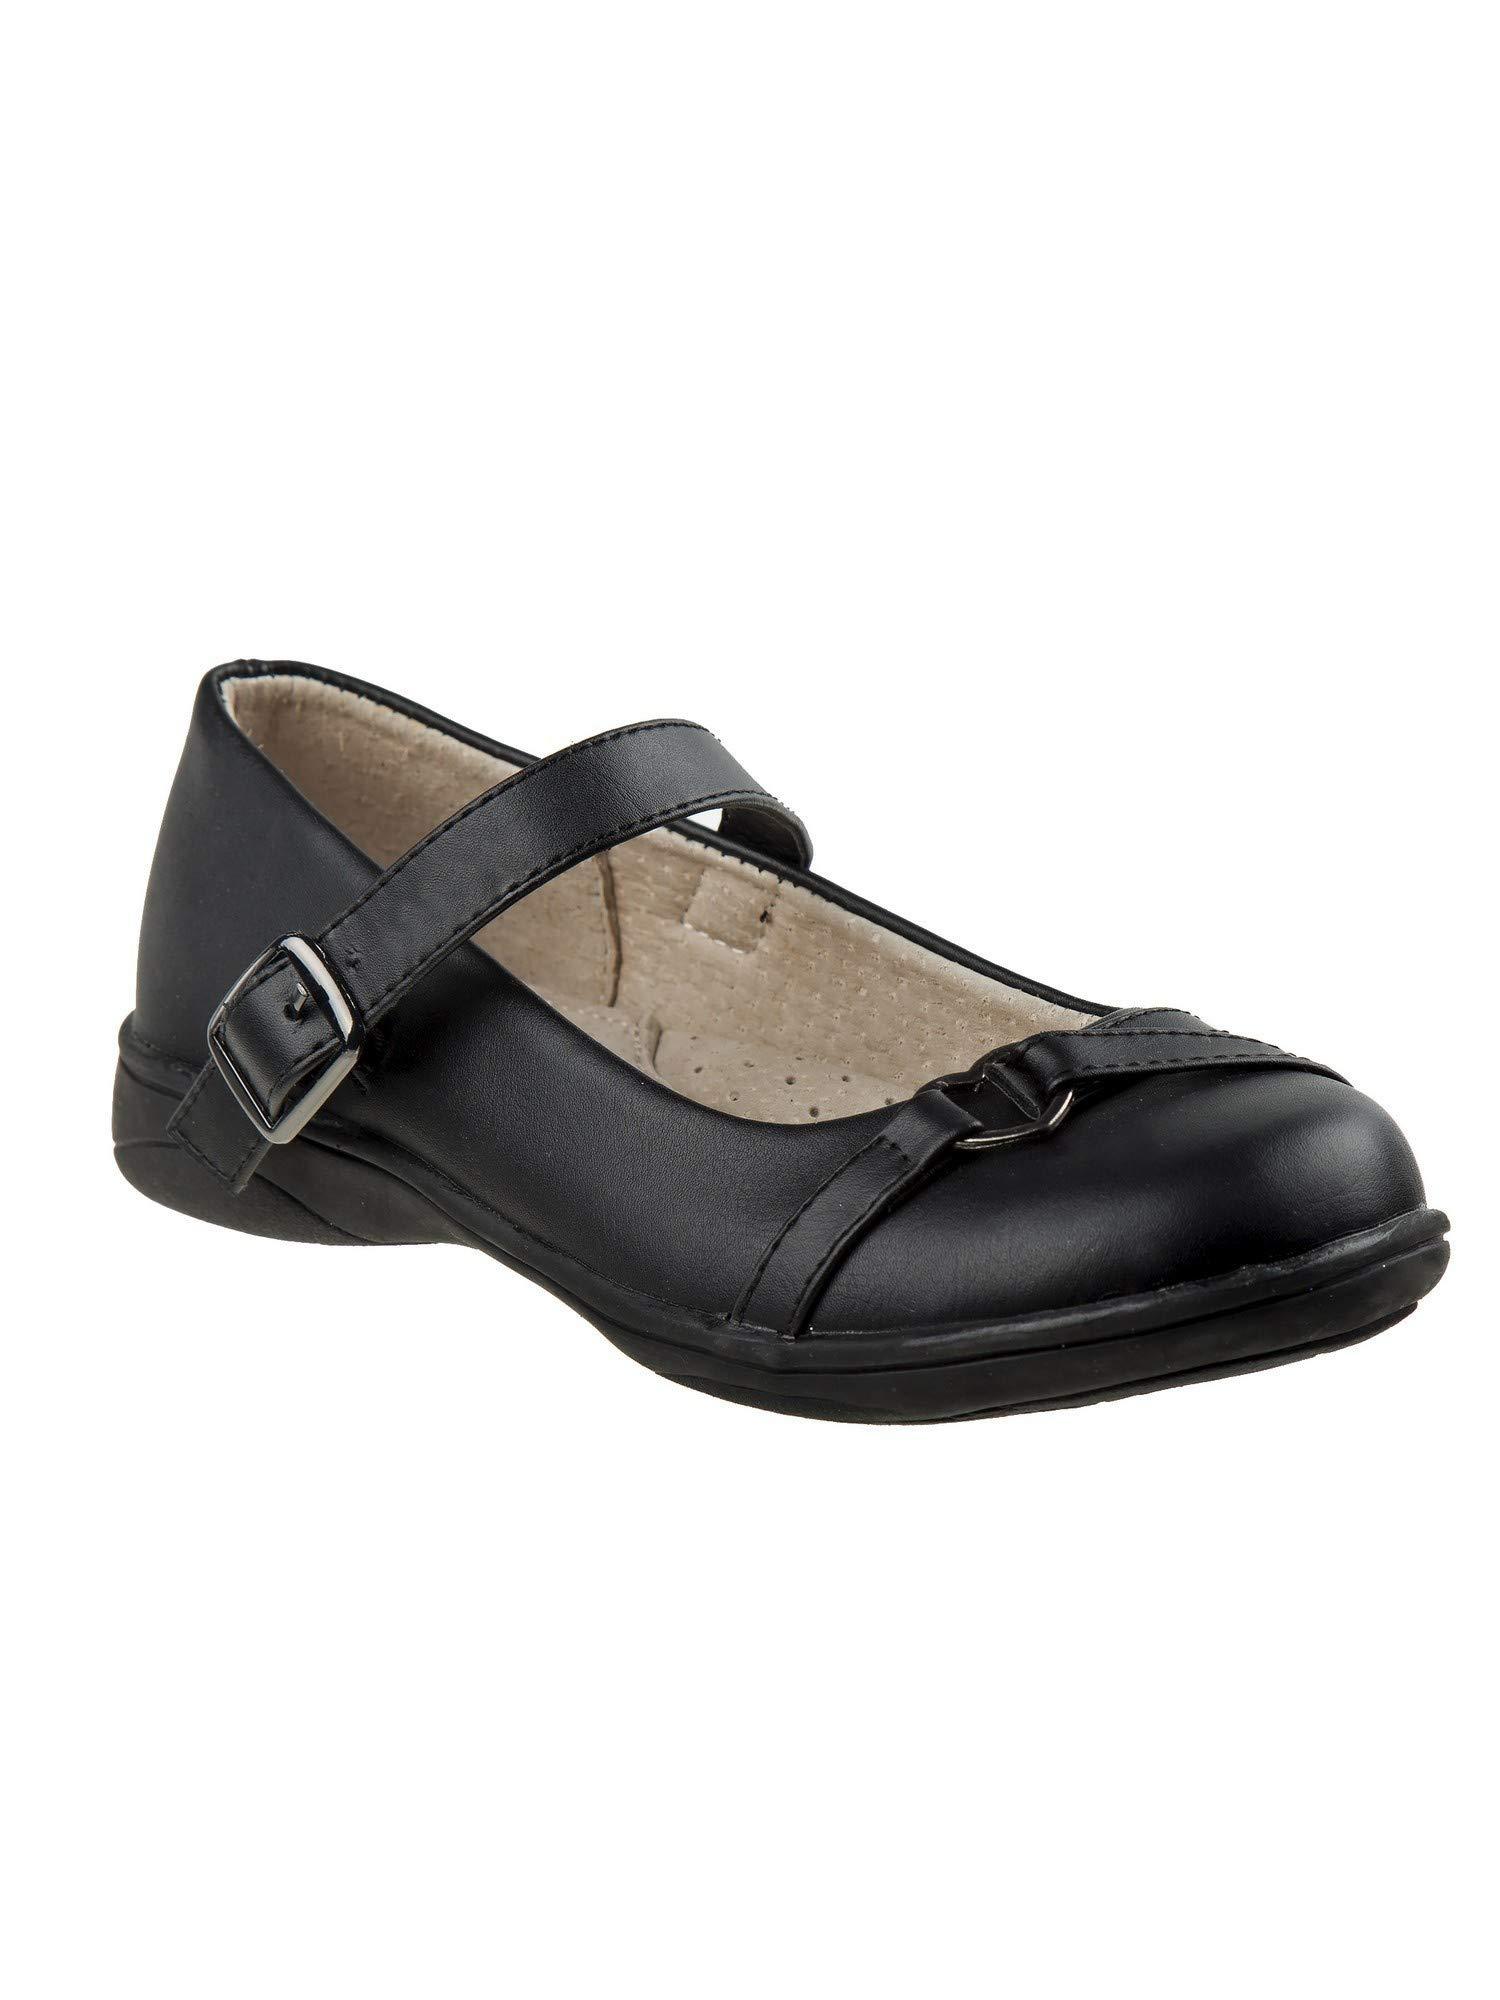 Laura Ashley Girls Black Heart Buckle Strap Mary Jane Shoes 3 Kids